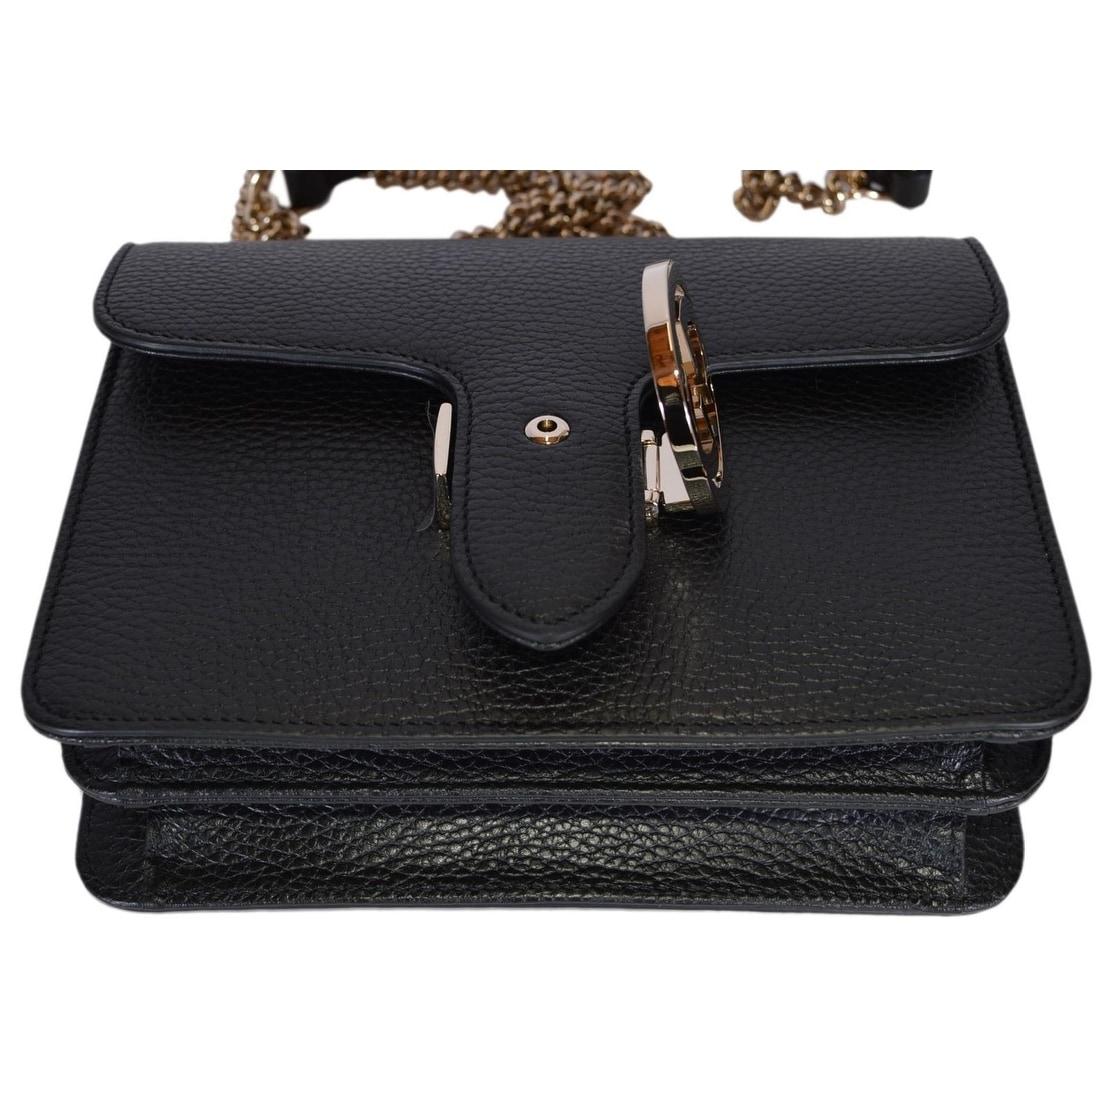 c525e8a19b9 Shop Gucci Women s Black Leather 510304 Interlocking GG Crossbody Purse  Handbag - 7.75